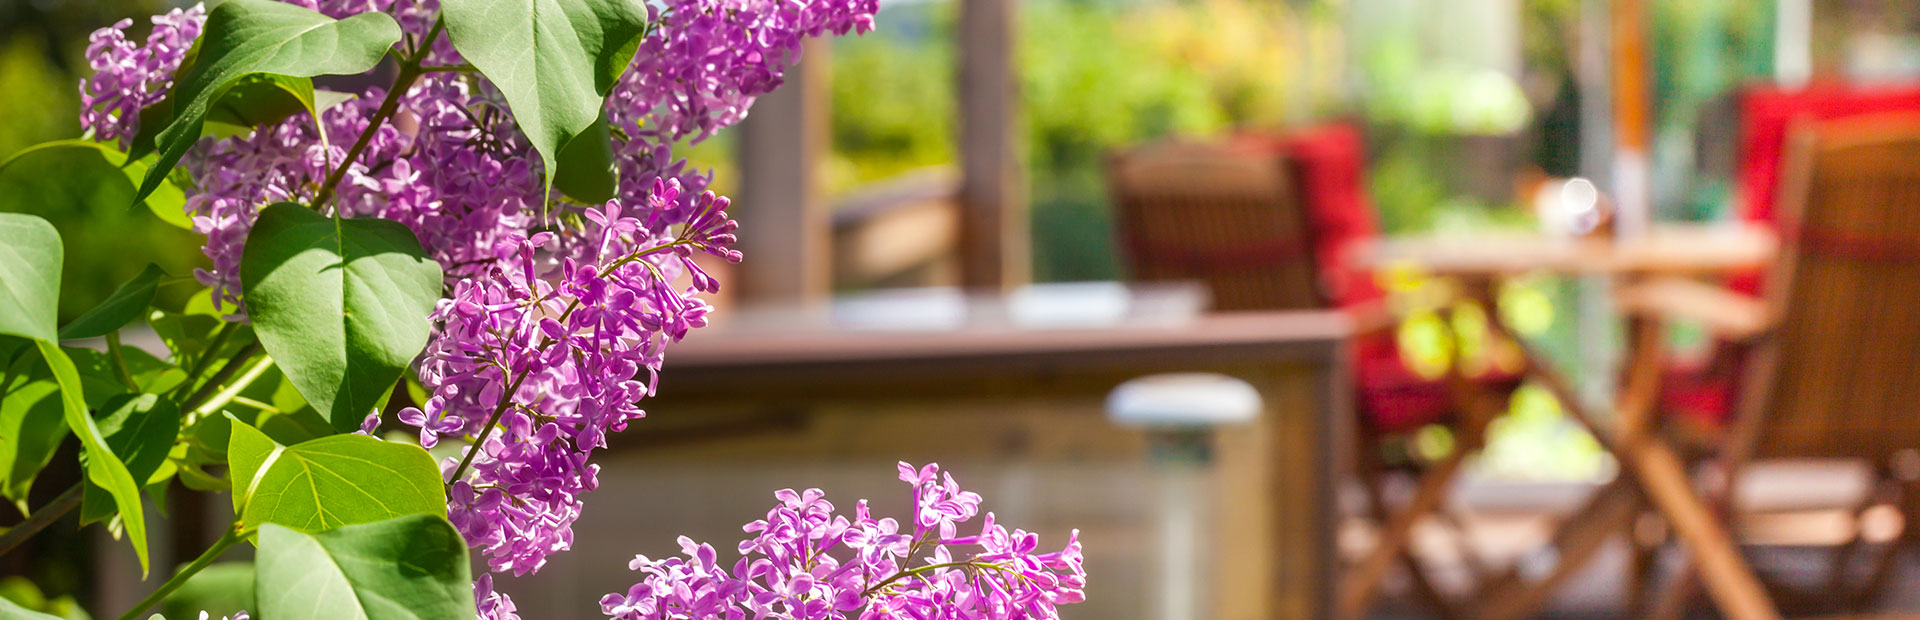 http://derstinelandscaping.com/wp-content/uploads/2019/08/lilacs-patio-slider.jpg